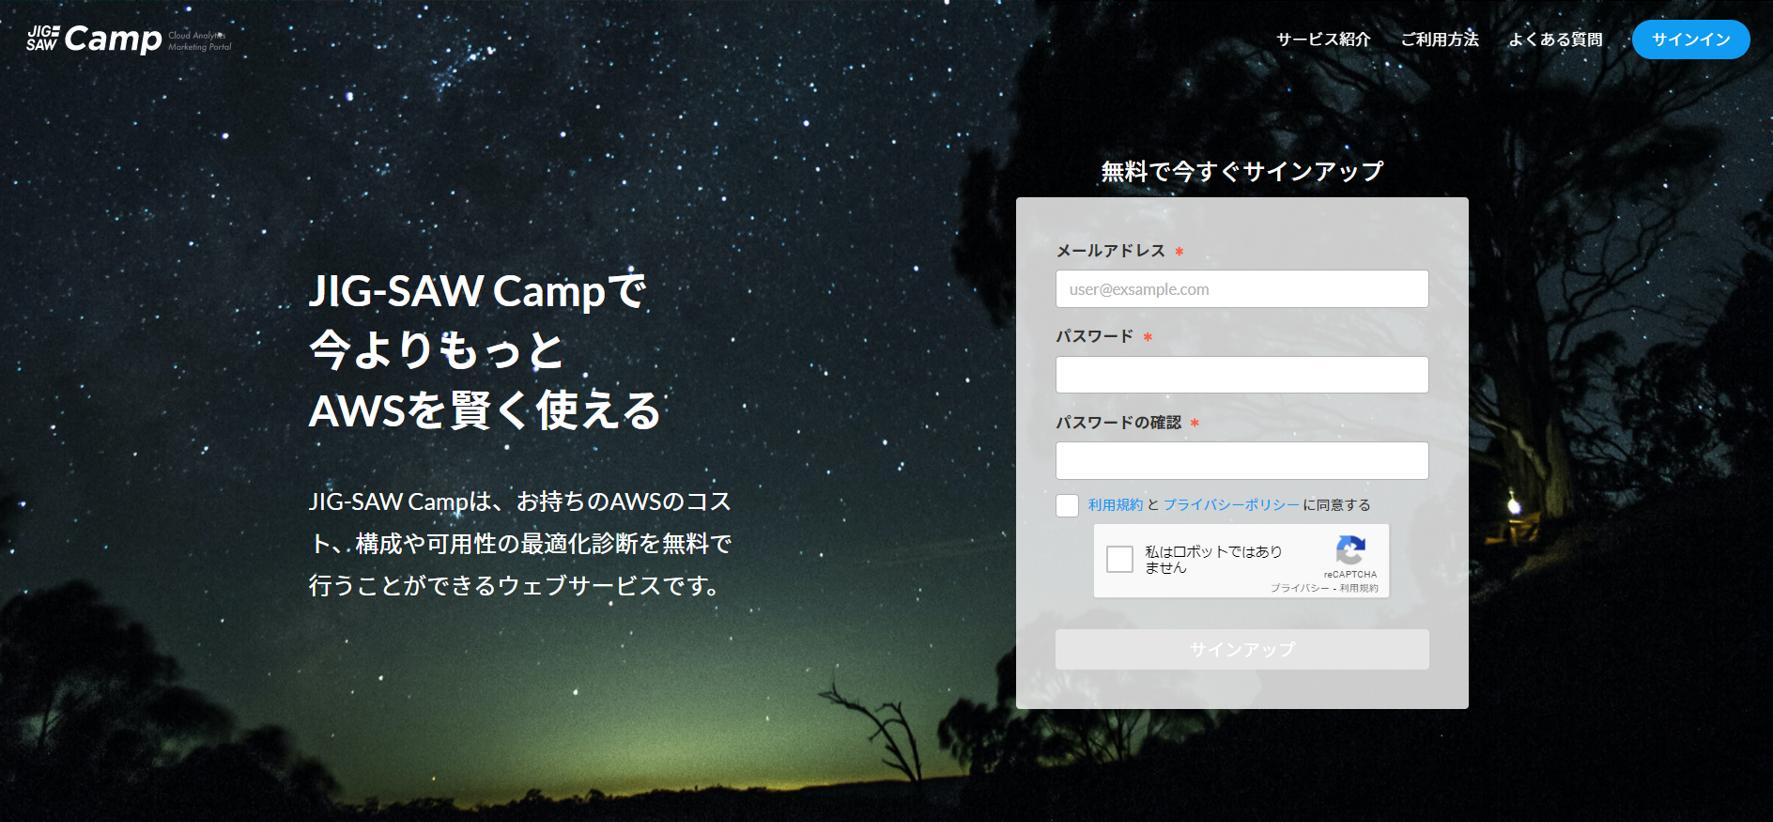 AWS無料診断 登録画面(JIG-SAW CAMP)